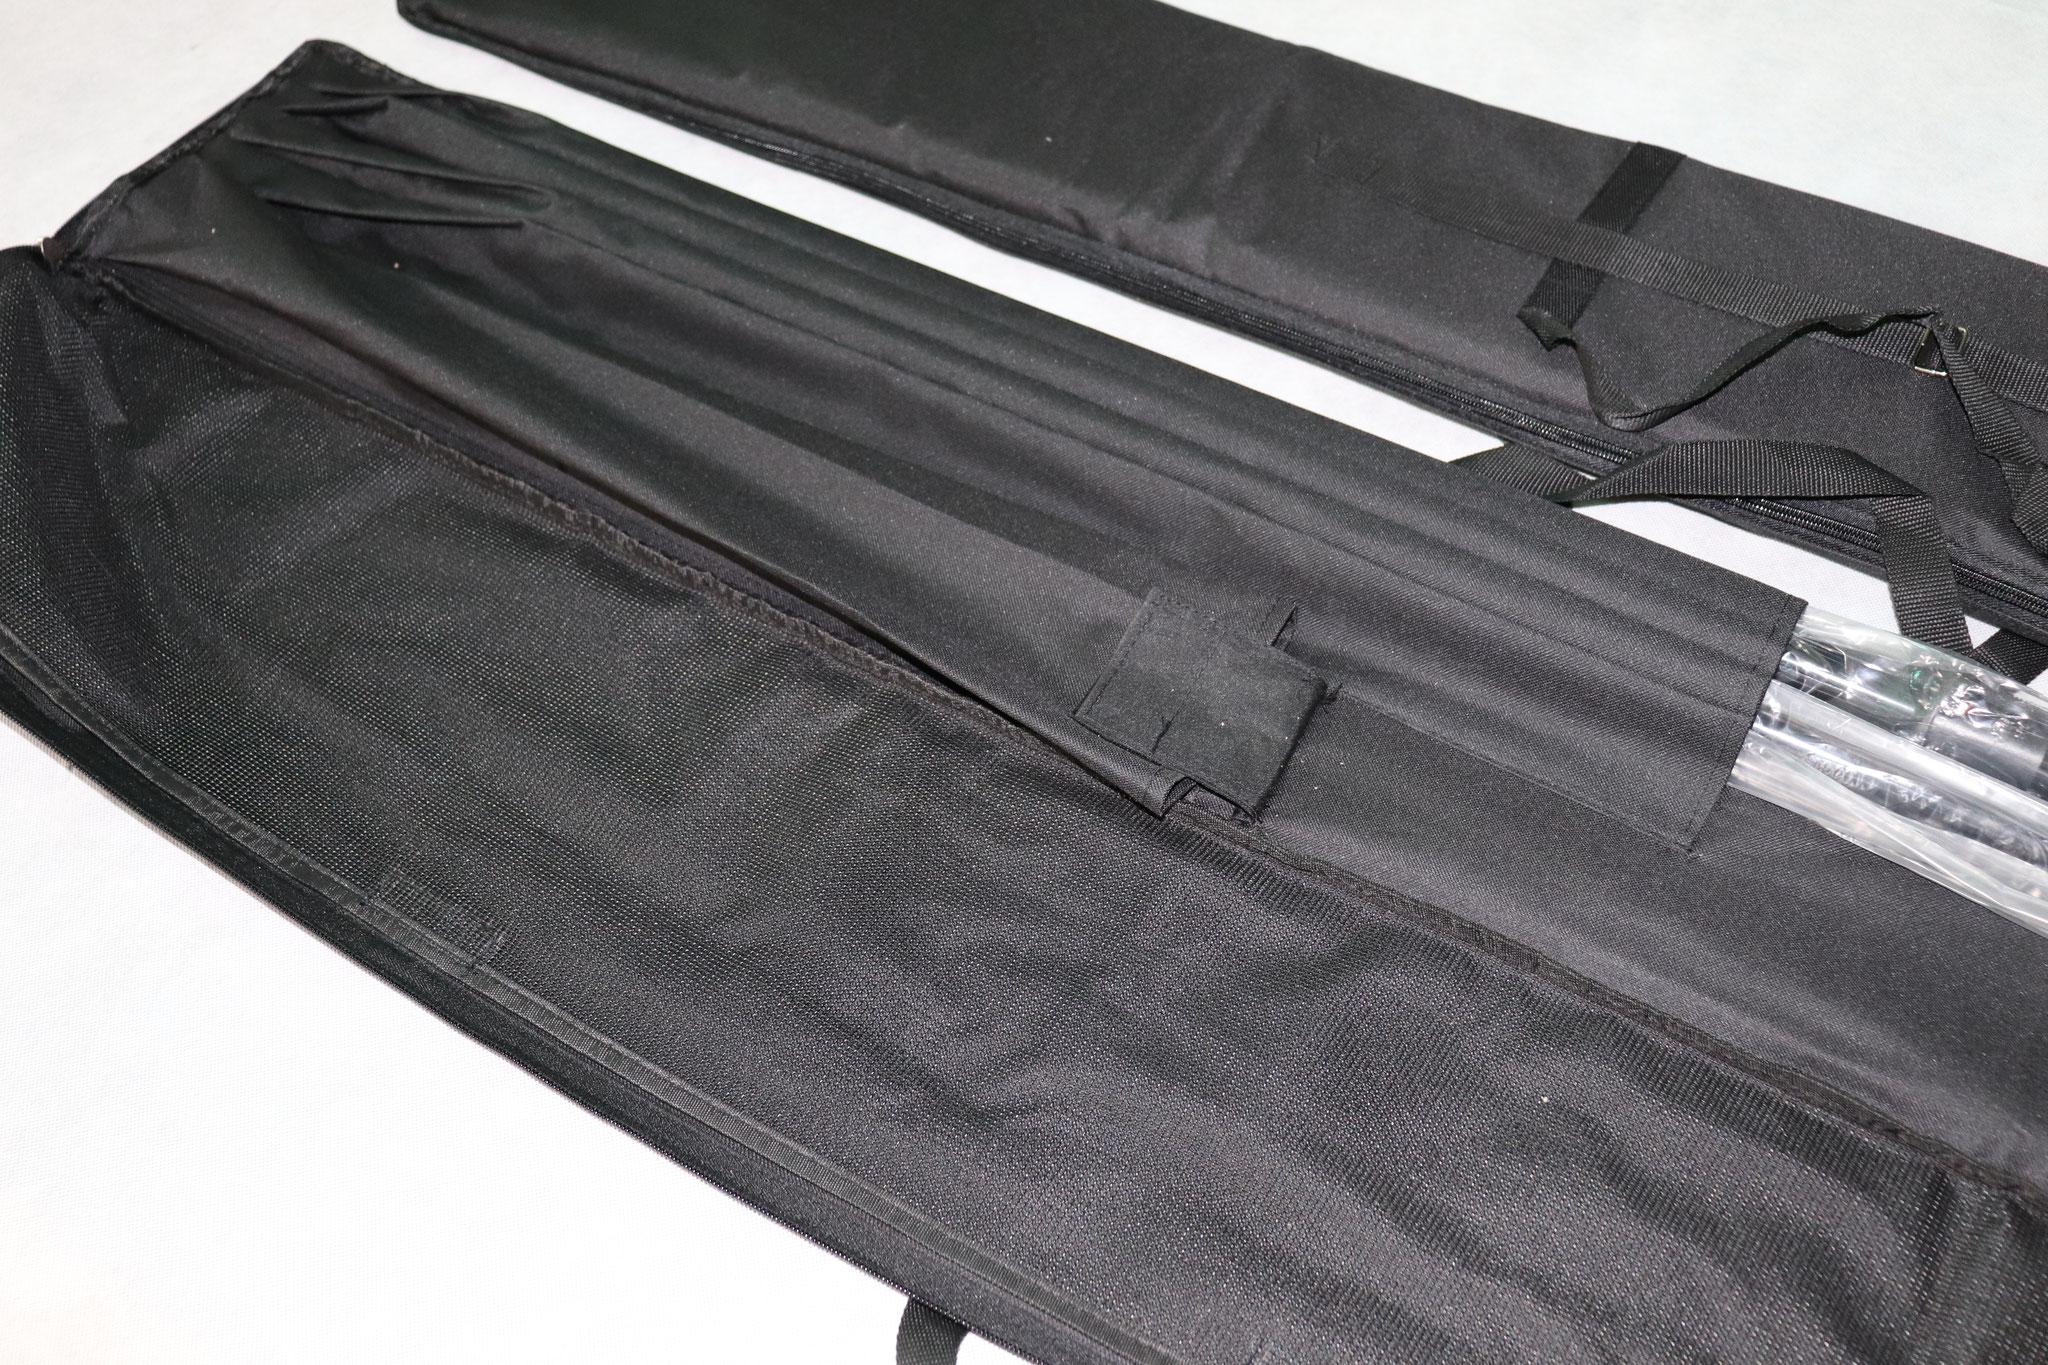 Fibrelight Feather Flags - Ground Spike Storage Velcro Storage Pocket